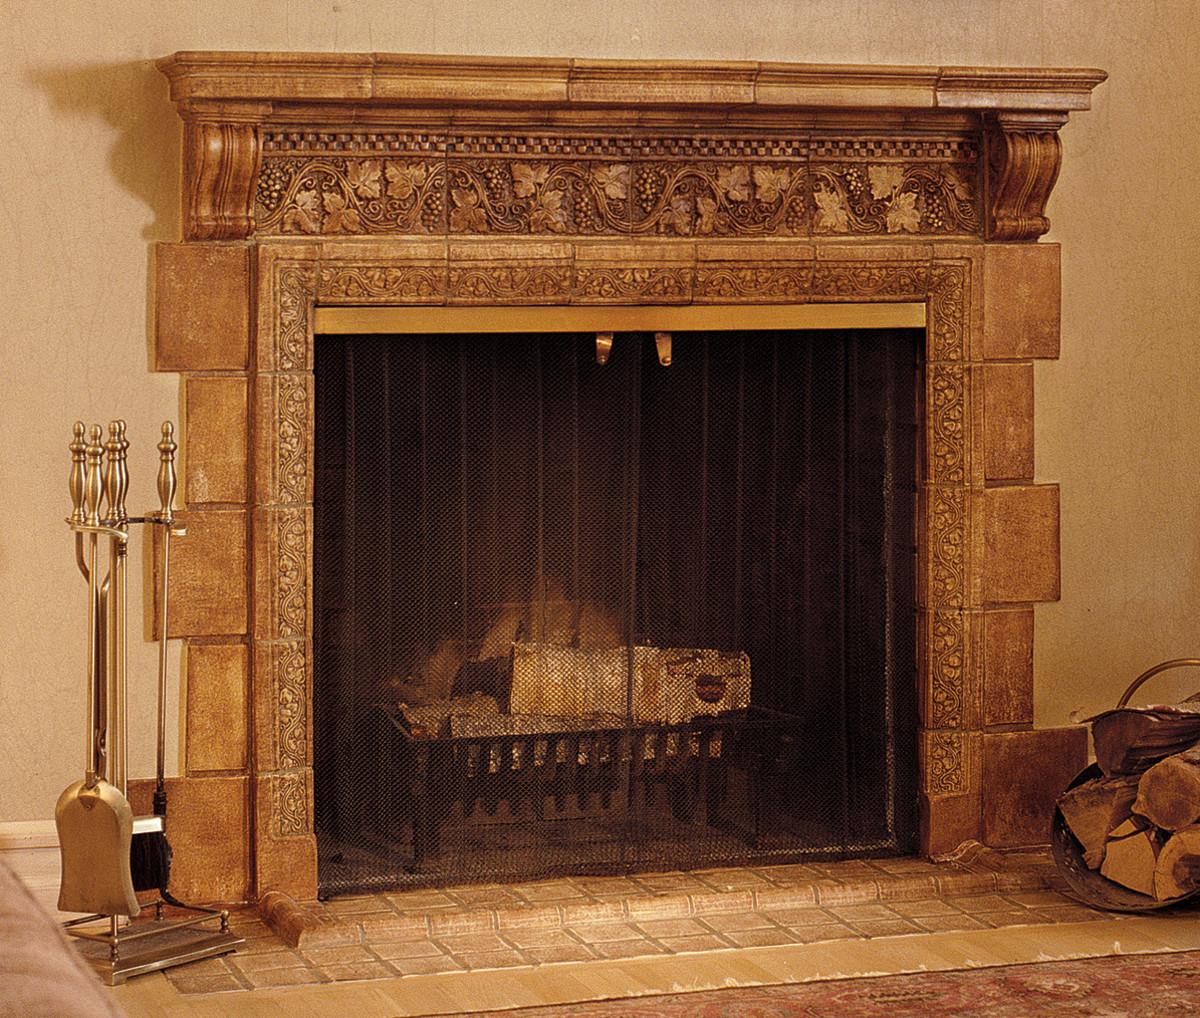 Original Batchelder tile fireplace